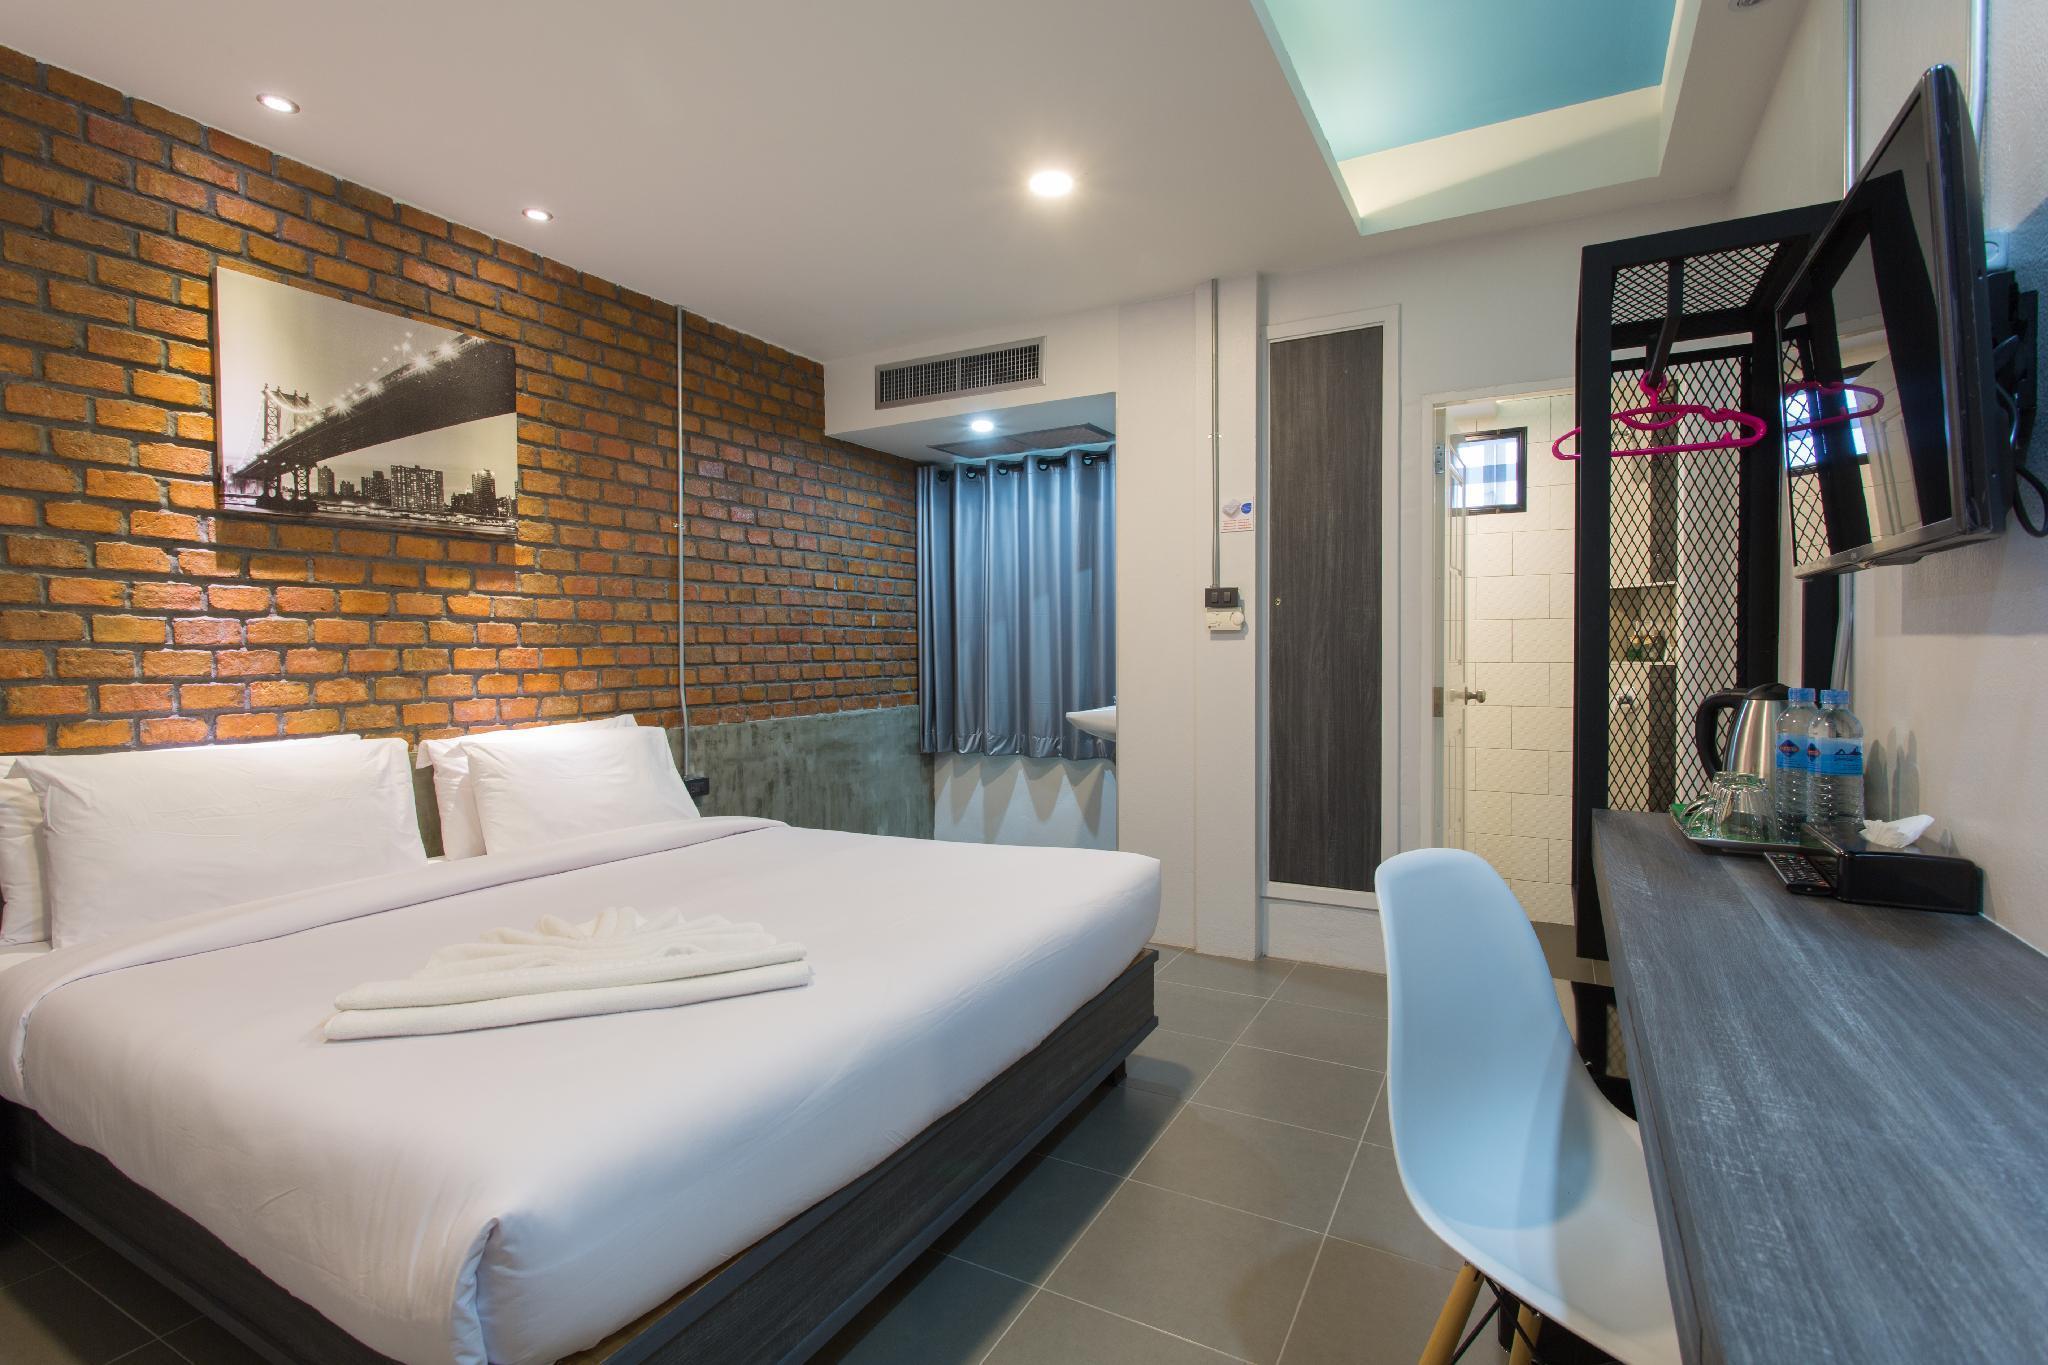 City Hotel Krabi โรงแรมซิตี้ กระบี่